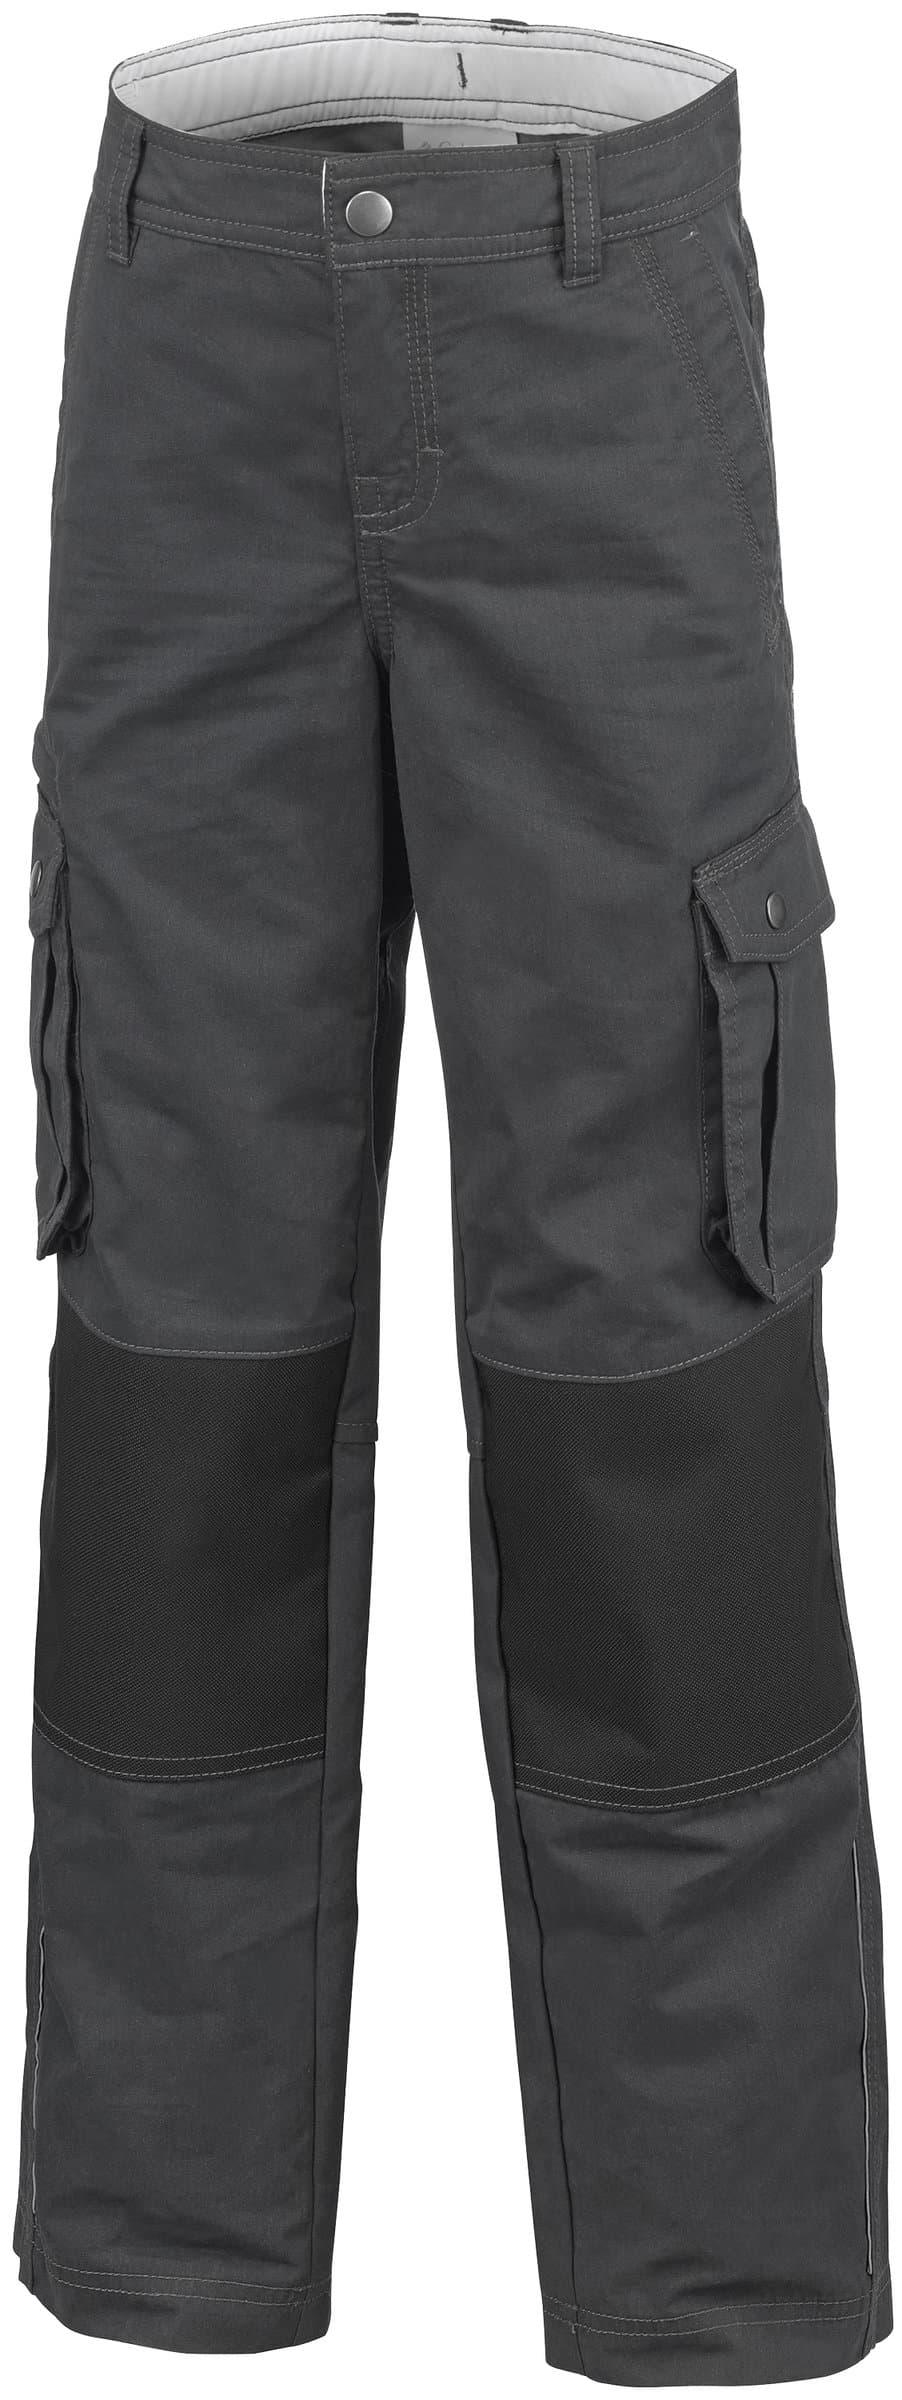 Columbia PINE BUTTE Pantalon de trekking pour garçon